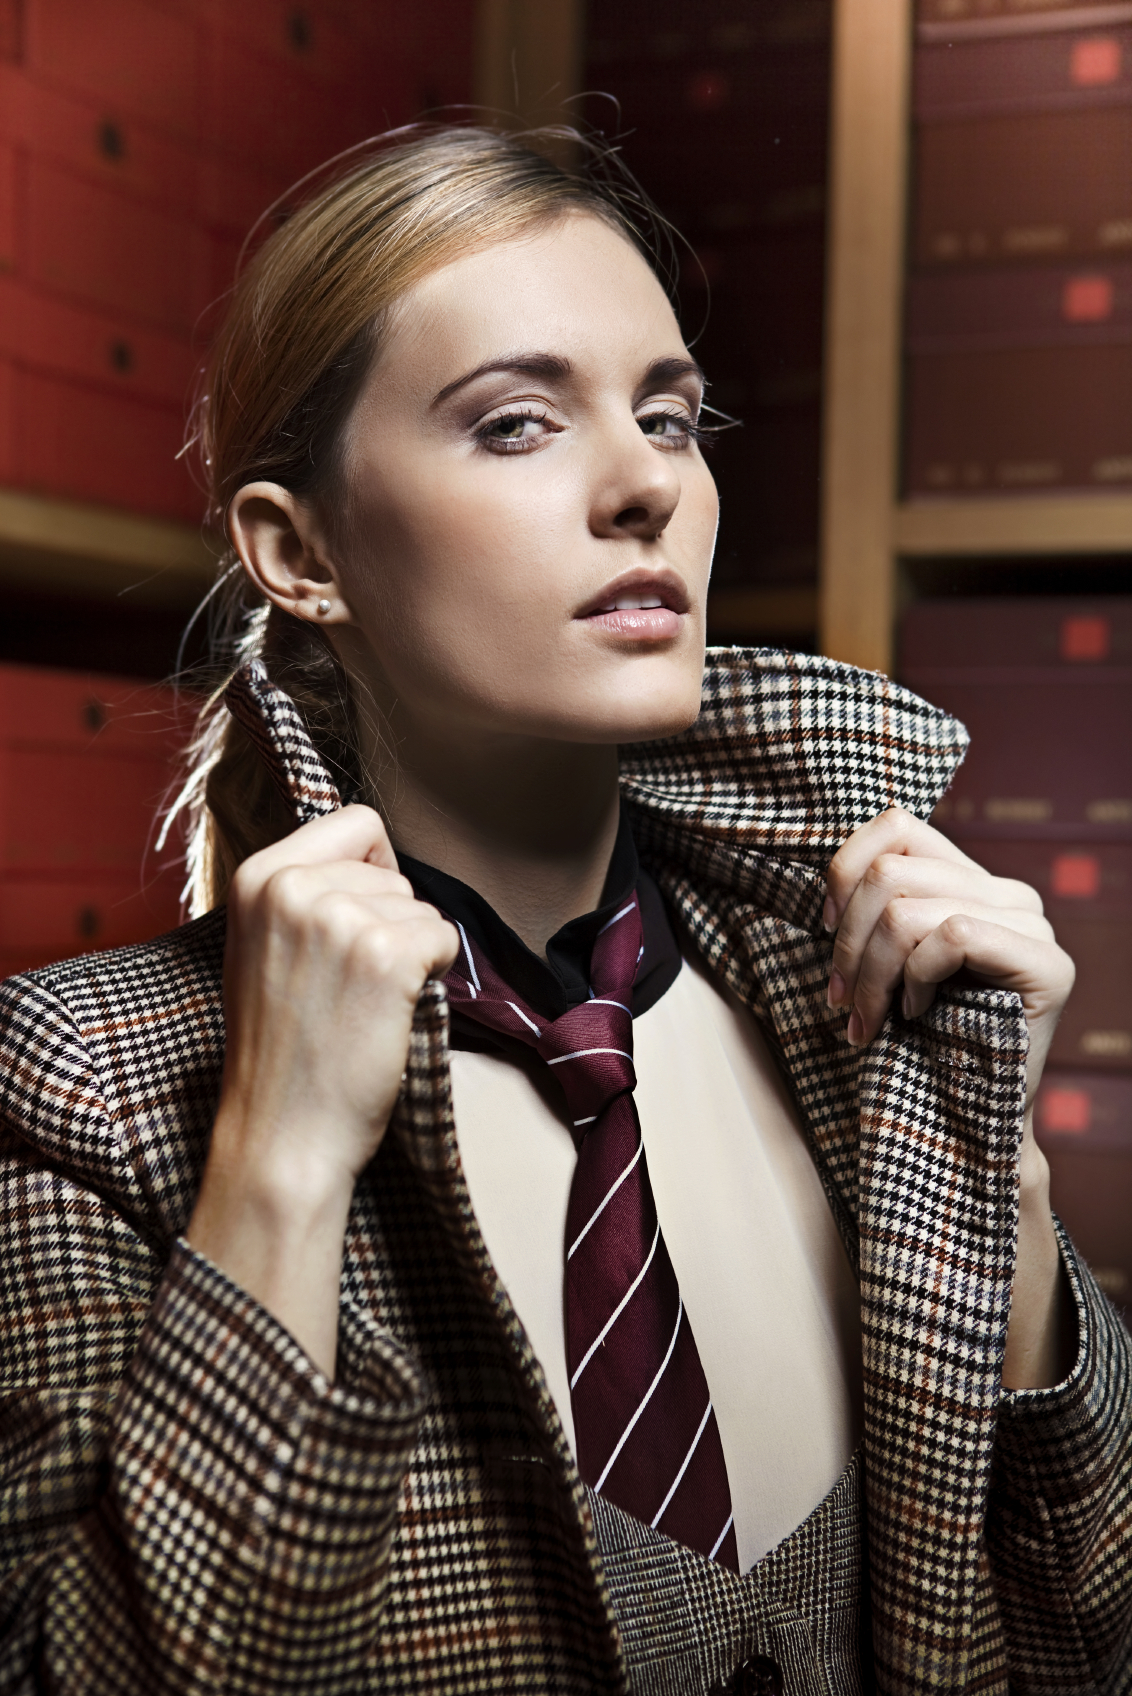 menswear - Fall 2015 - The Confident Woman